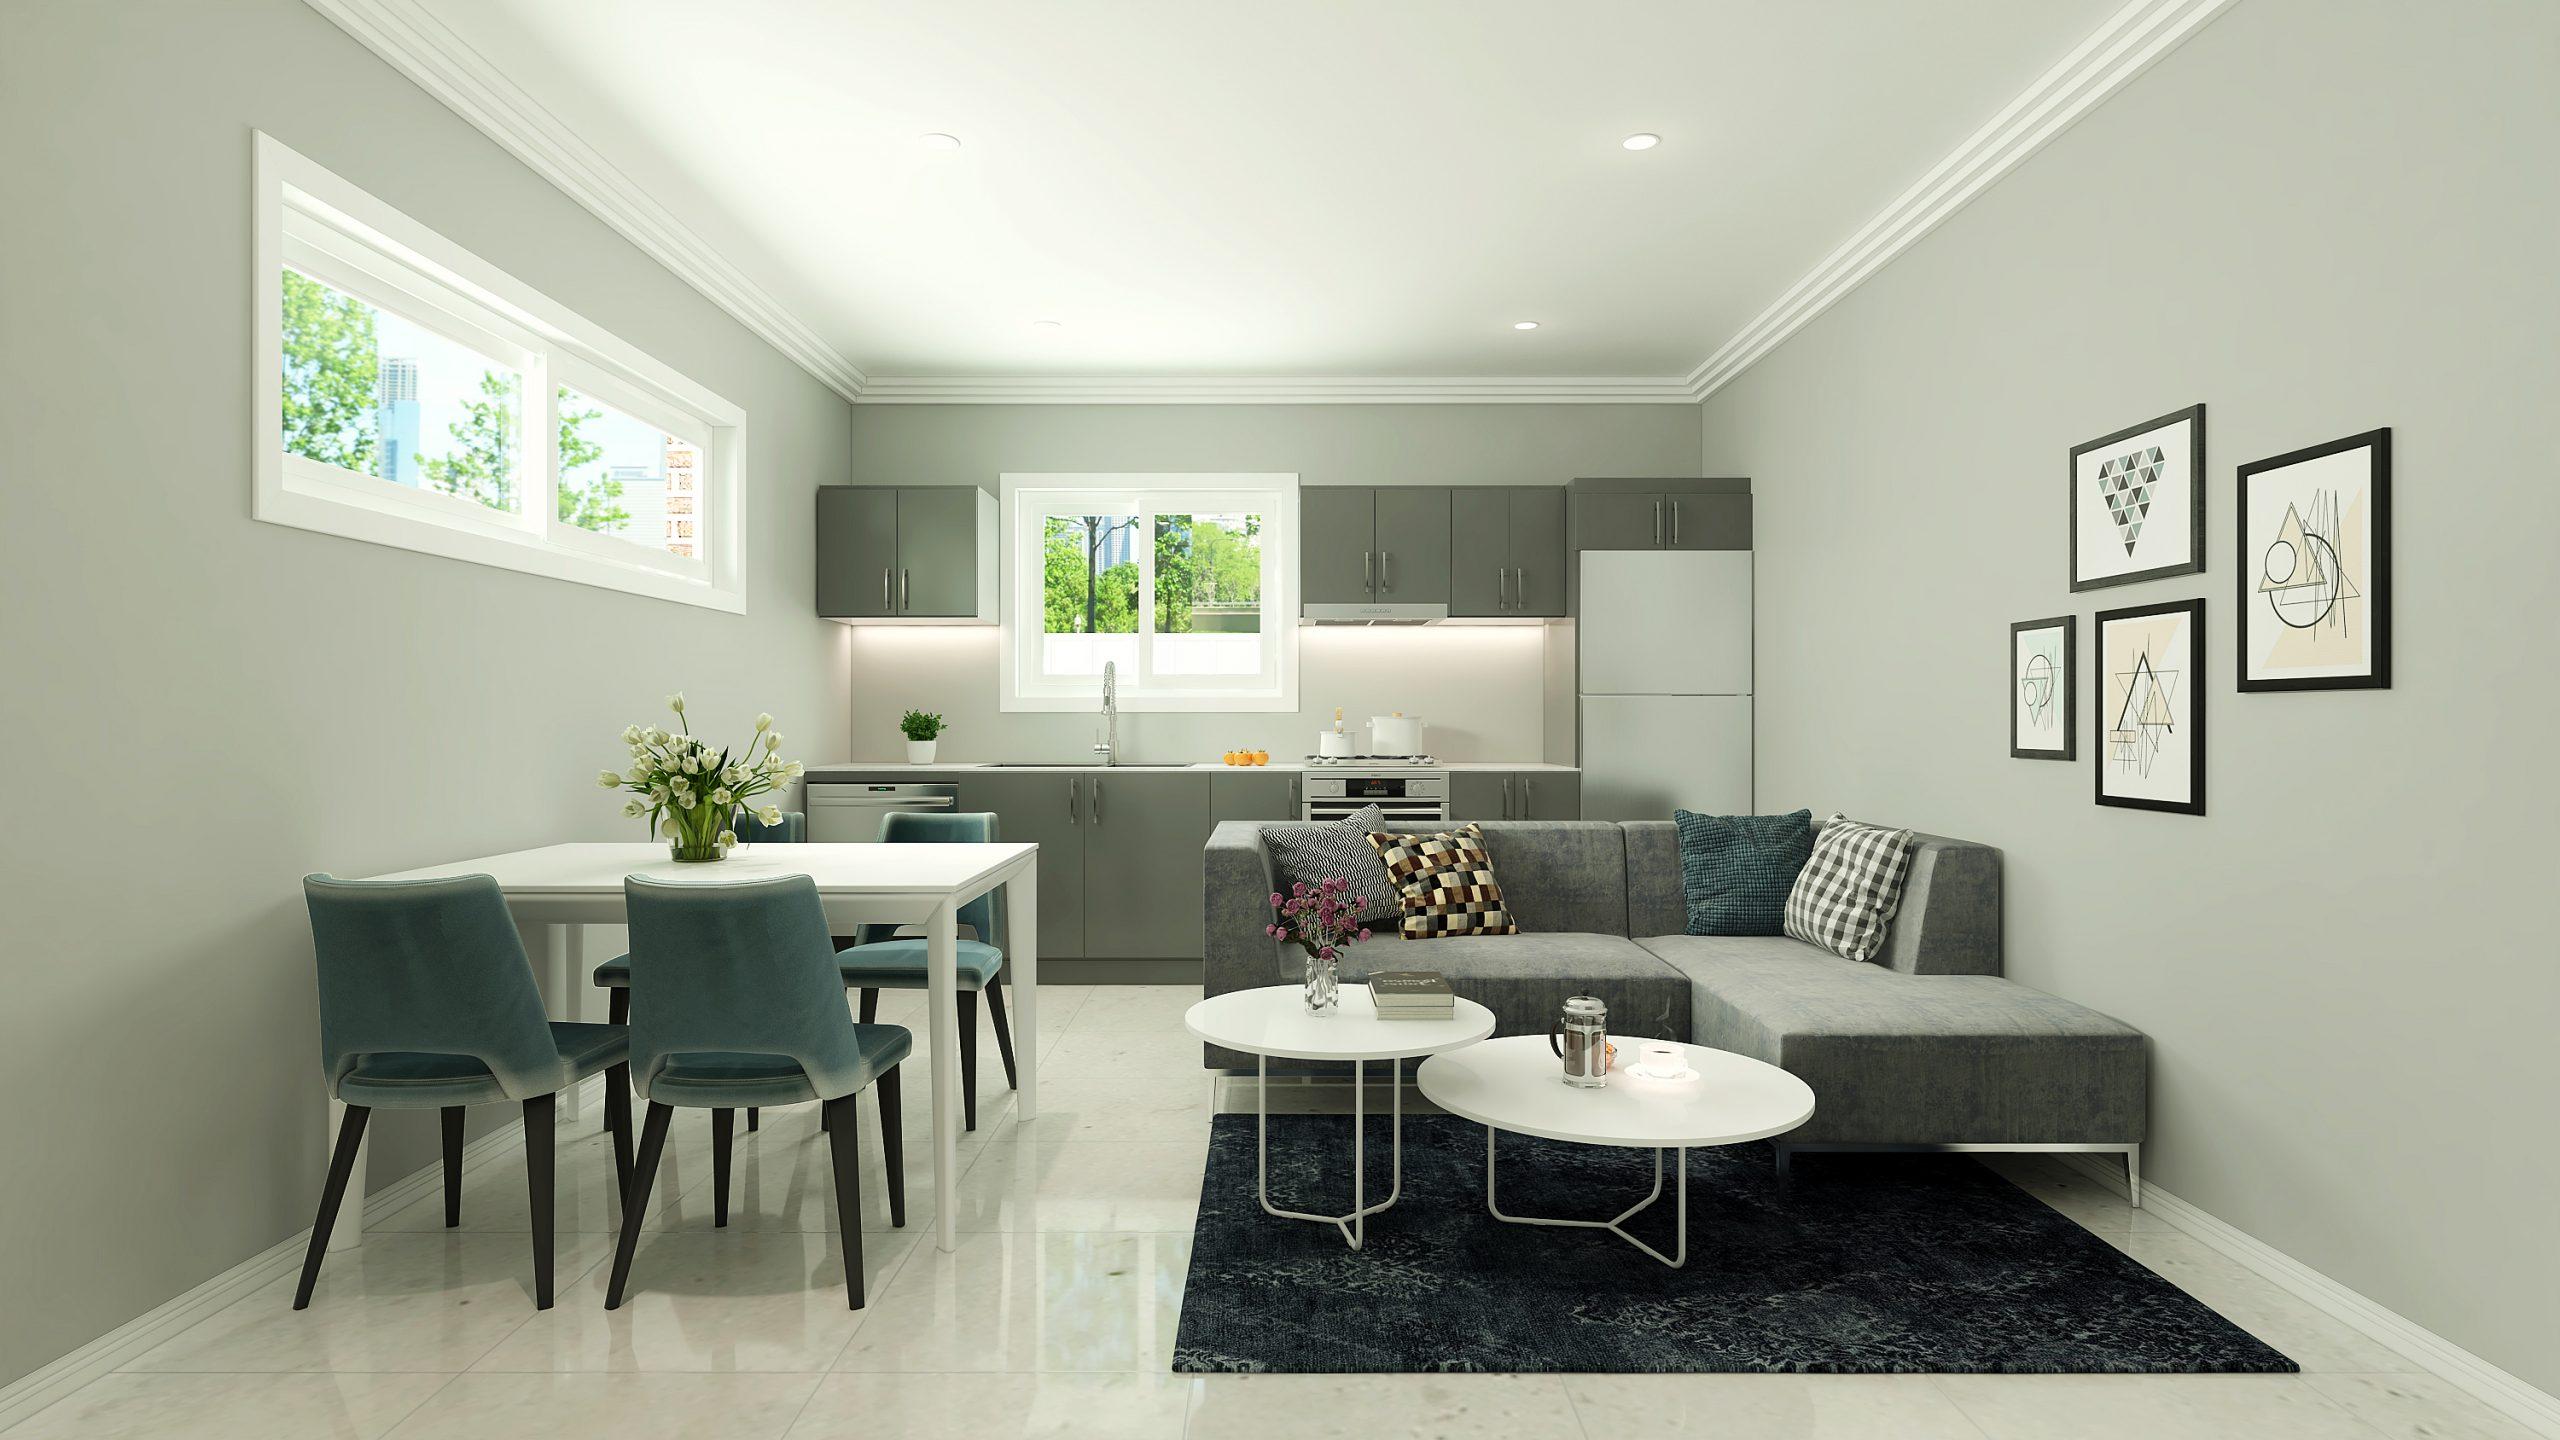 3 Room Flat granny flat builders | 100% customisable plans | db homes